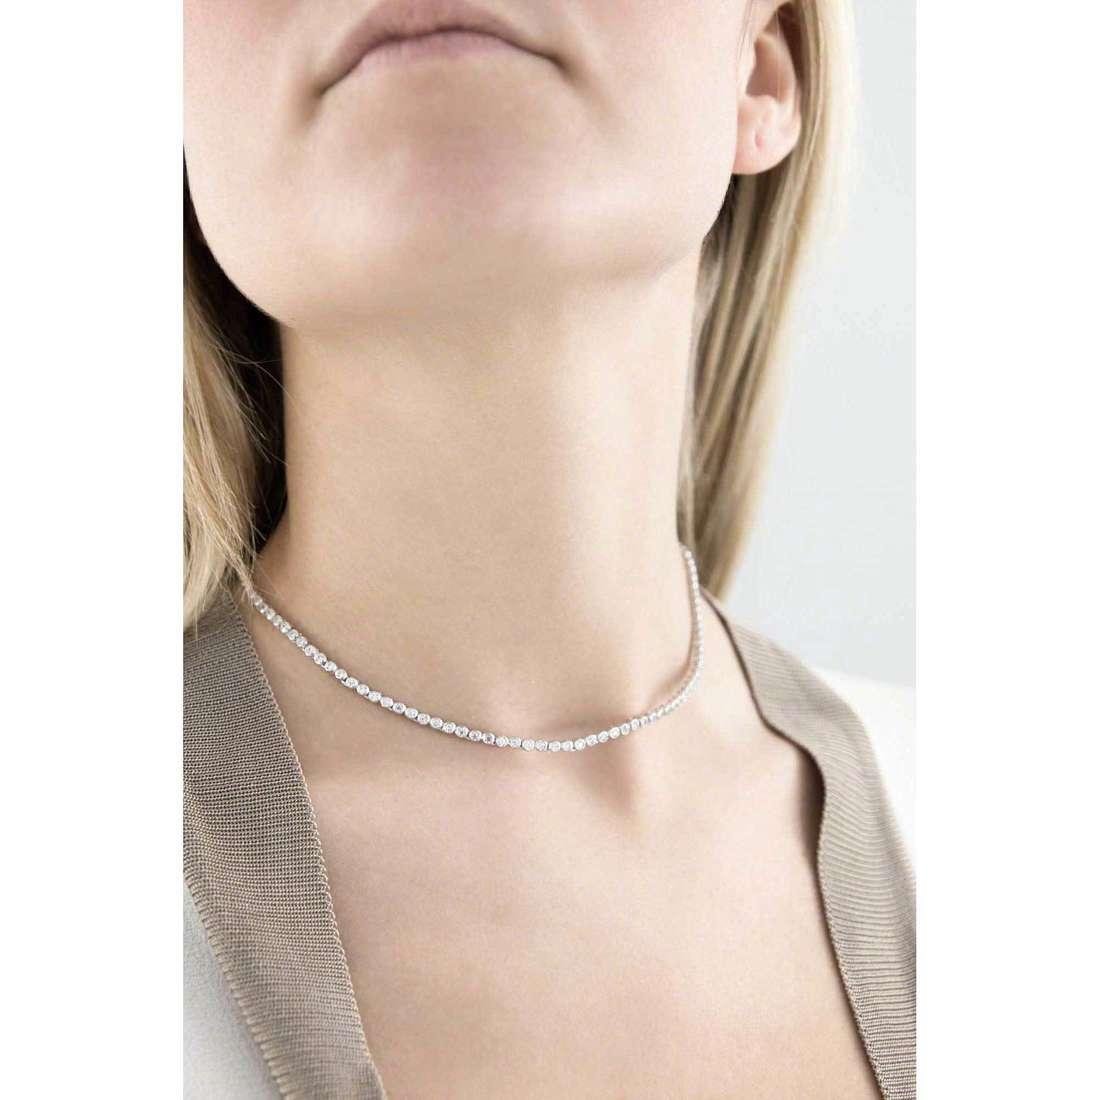 GioiaPura colliers femme 25026-01-40 indosso